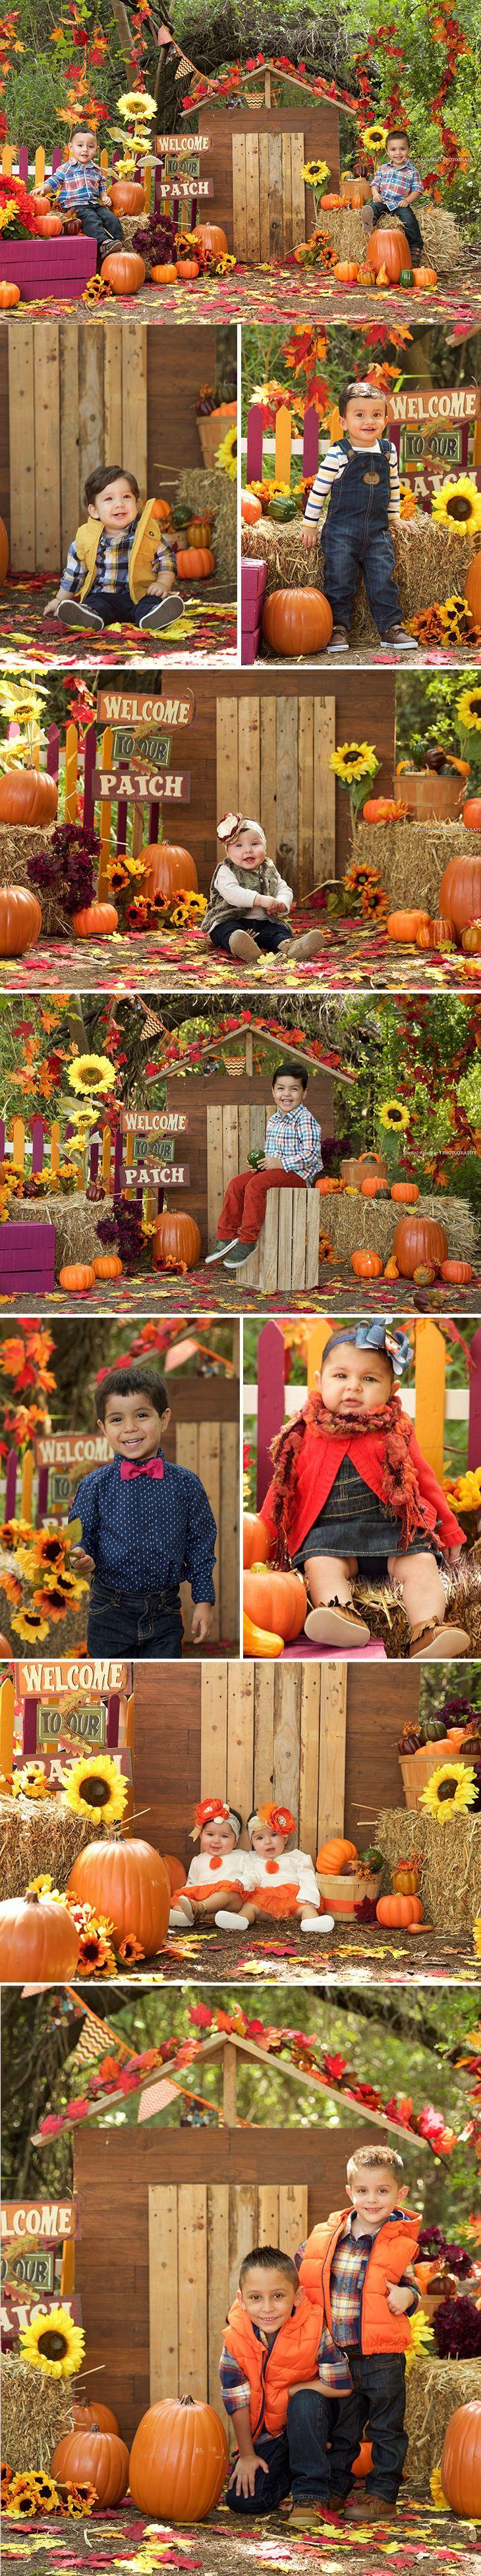 Halloween Photography - Fall Mini Session, Fall, Mini Session, Ideas, Fall Mini Session Set, Pumpkins,